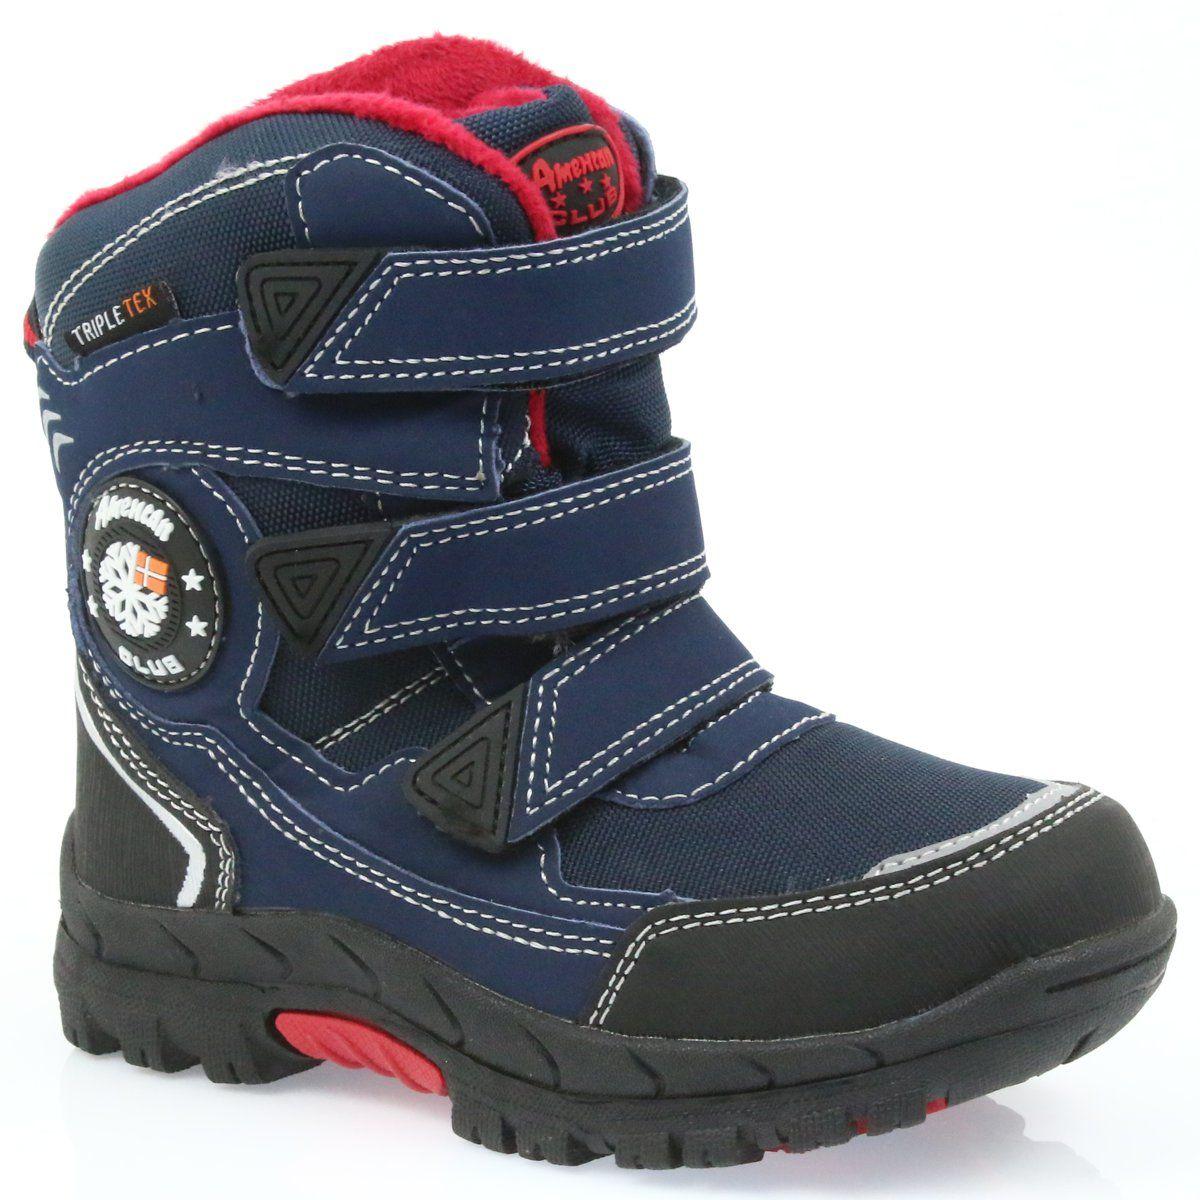 American Club American Kozaki Buty Zimowe Z Membrana 0926 Czarne Czerwone Granatowe Boots Shoes Winter Boot